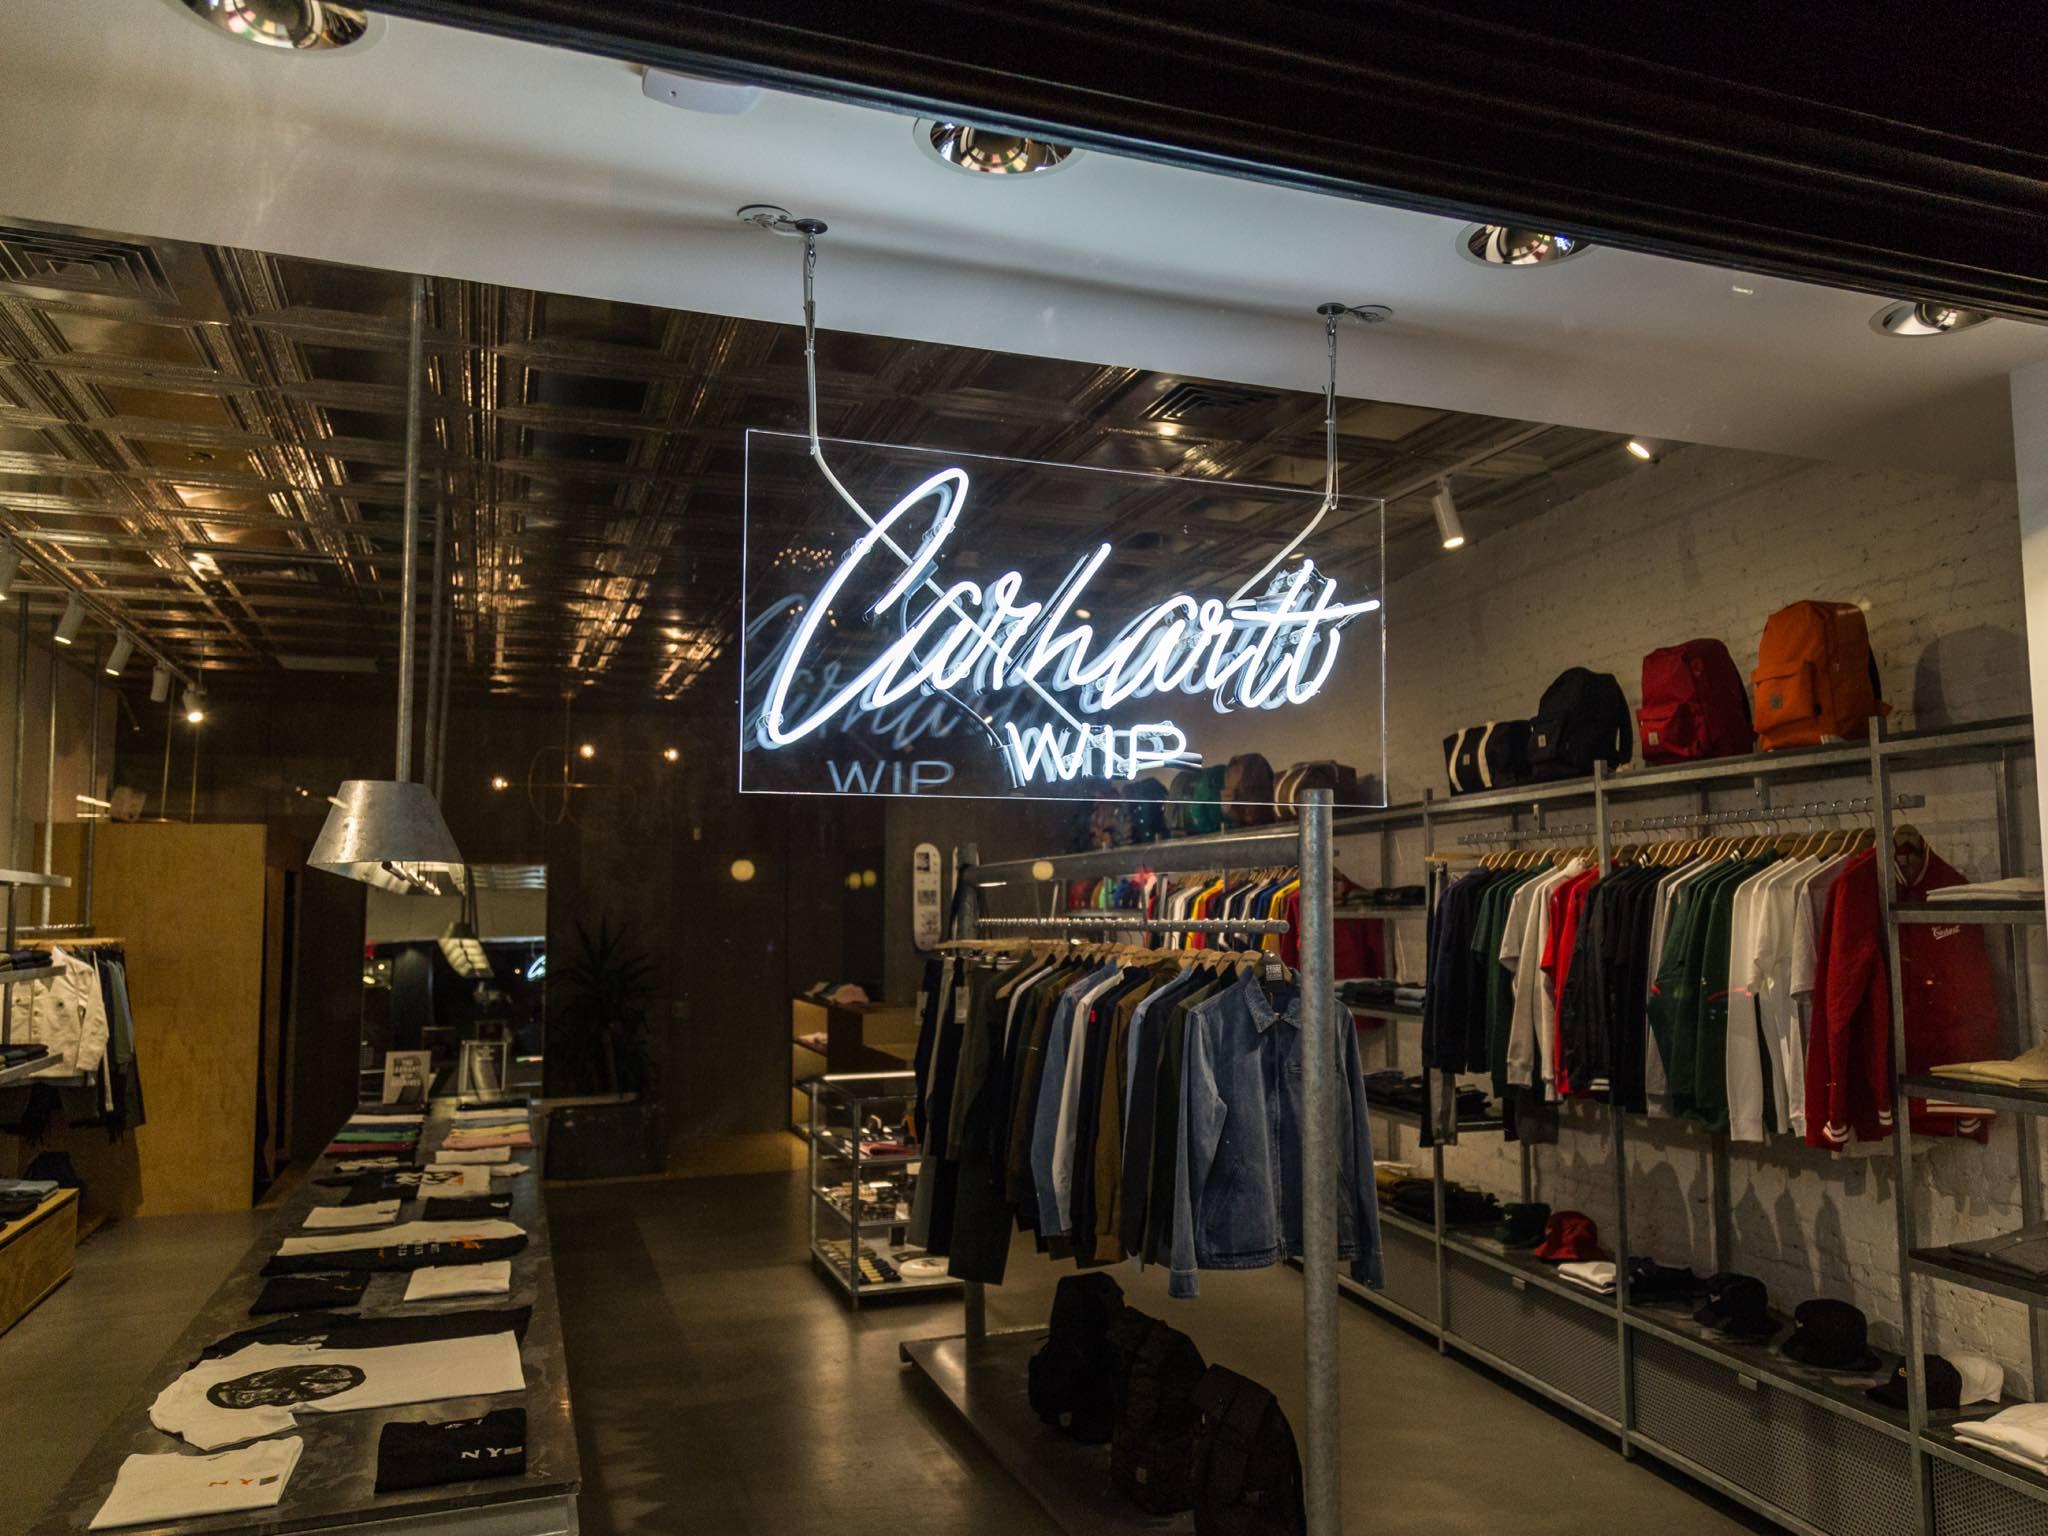 Carhartt WIP Flagship Store